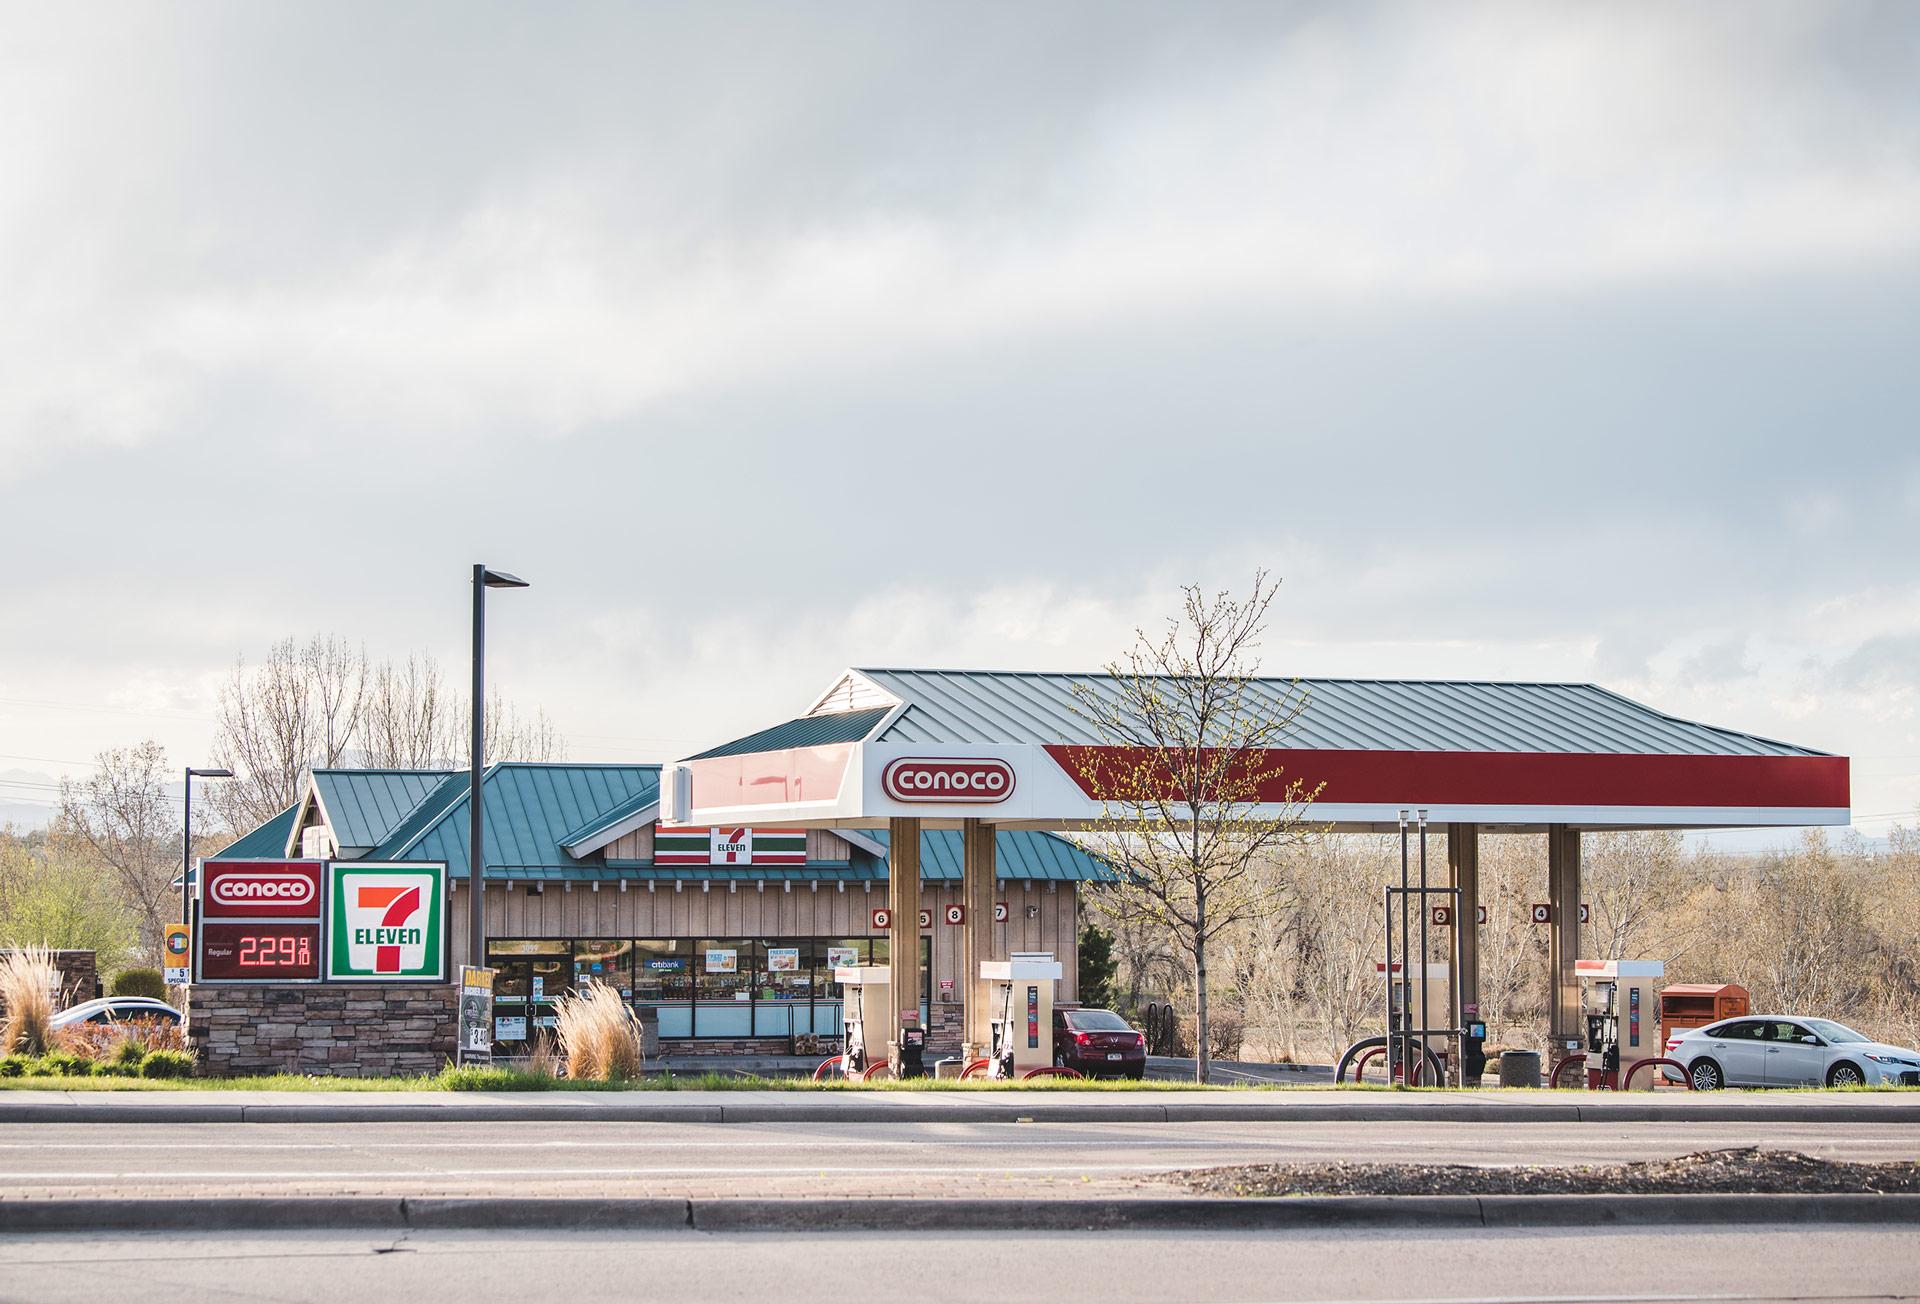 3099 West Mineral Avenue, Littleton, CO 80120